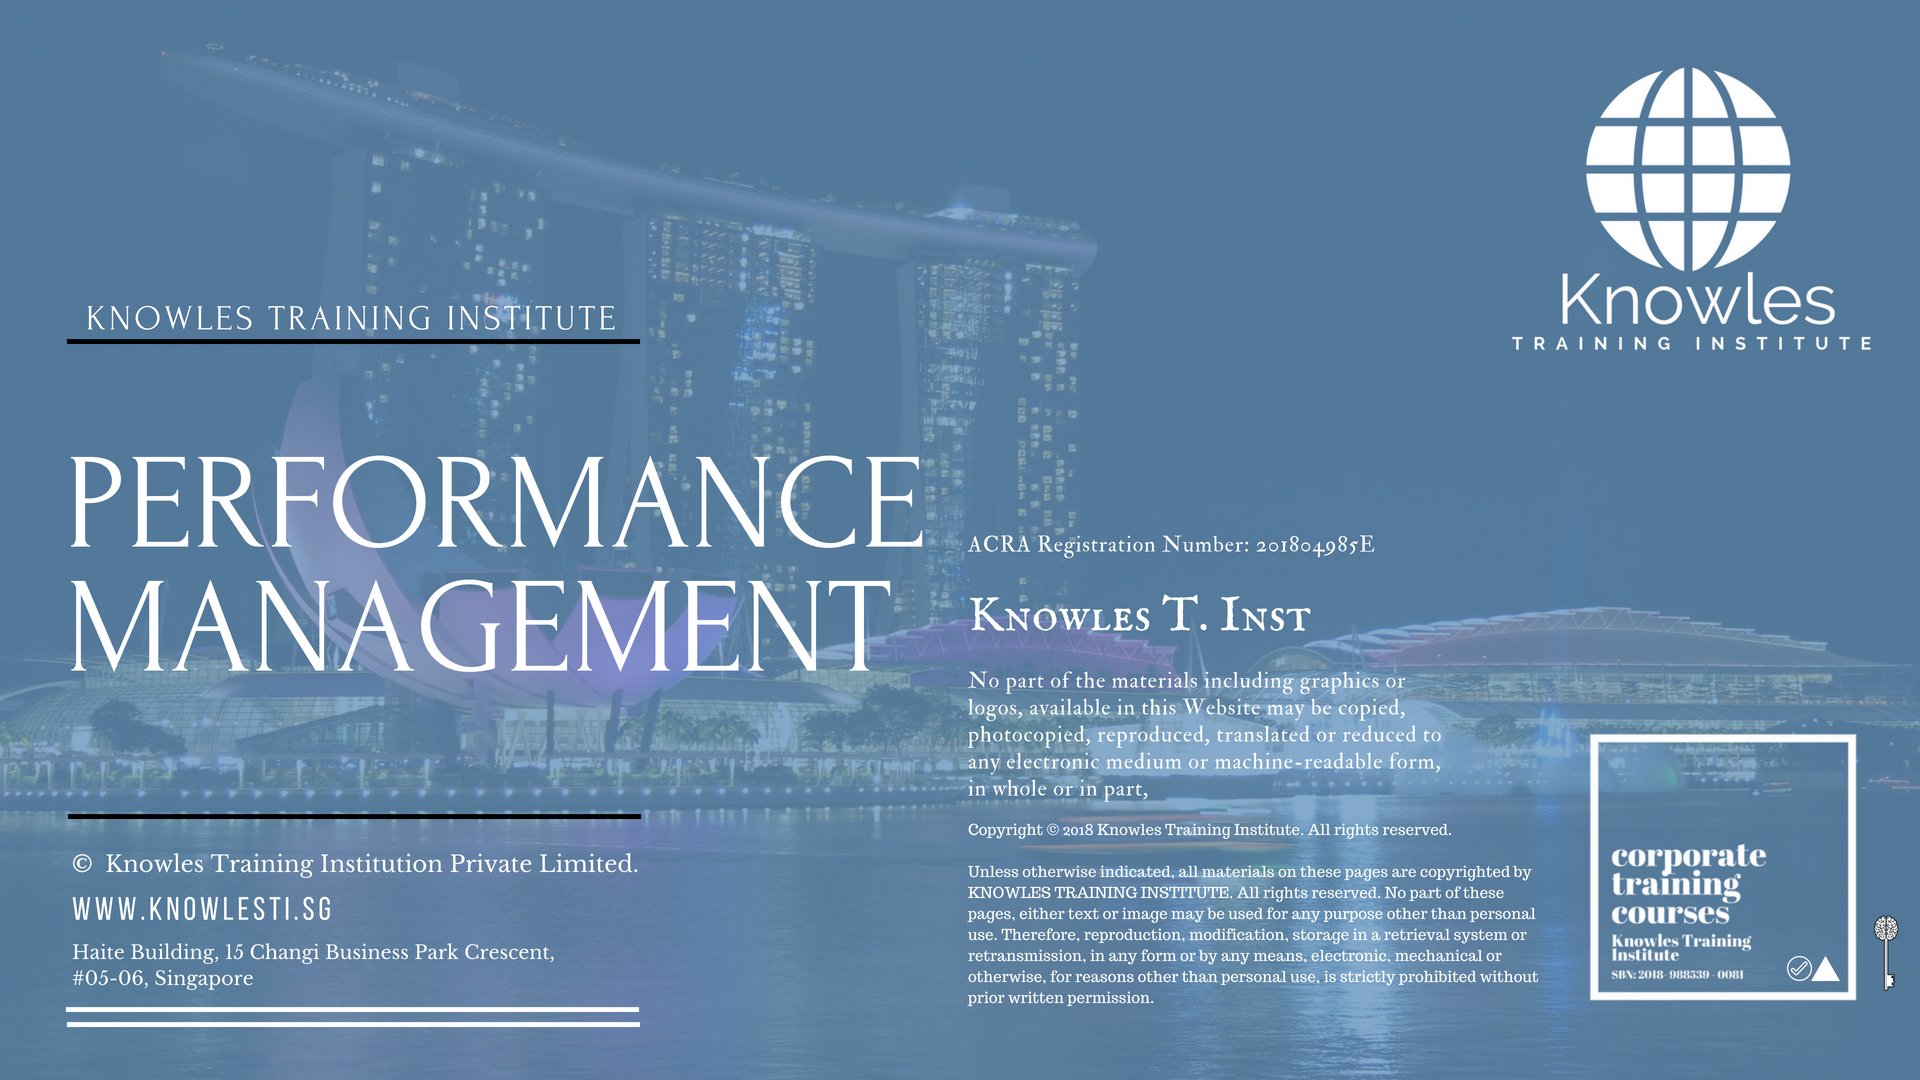 Performance Management Training Course